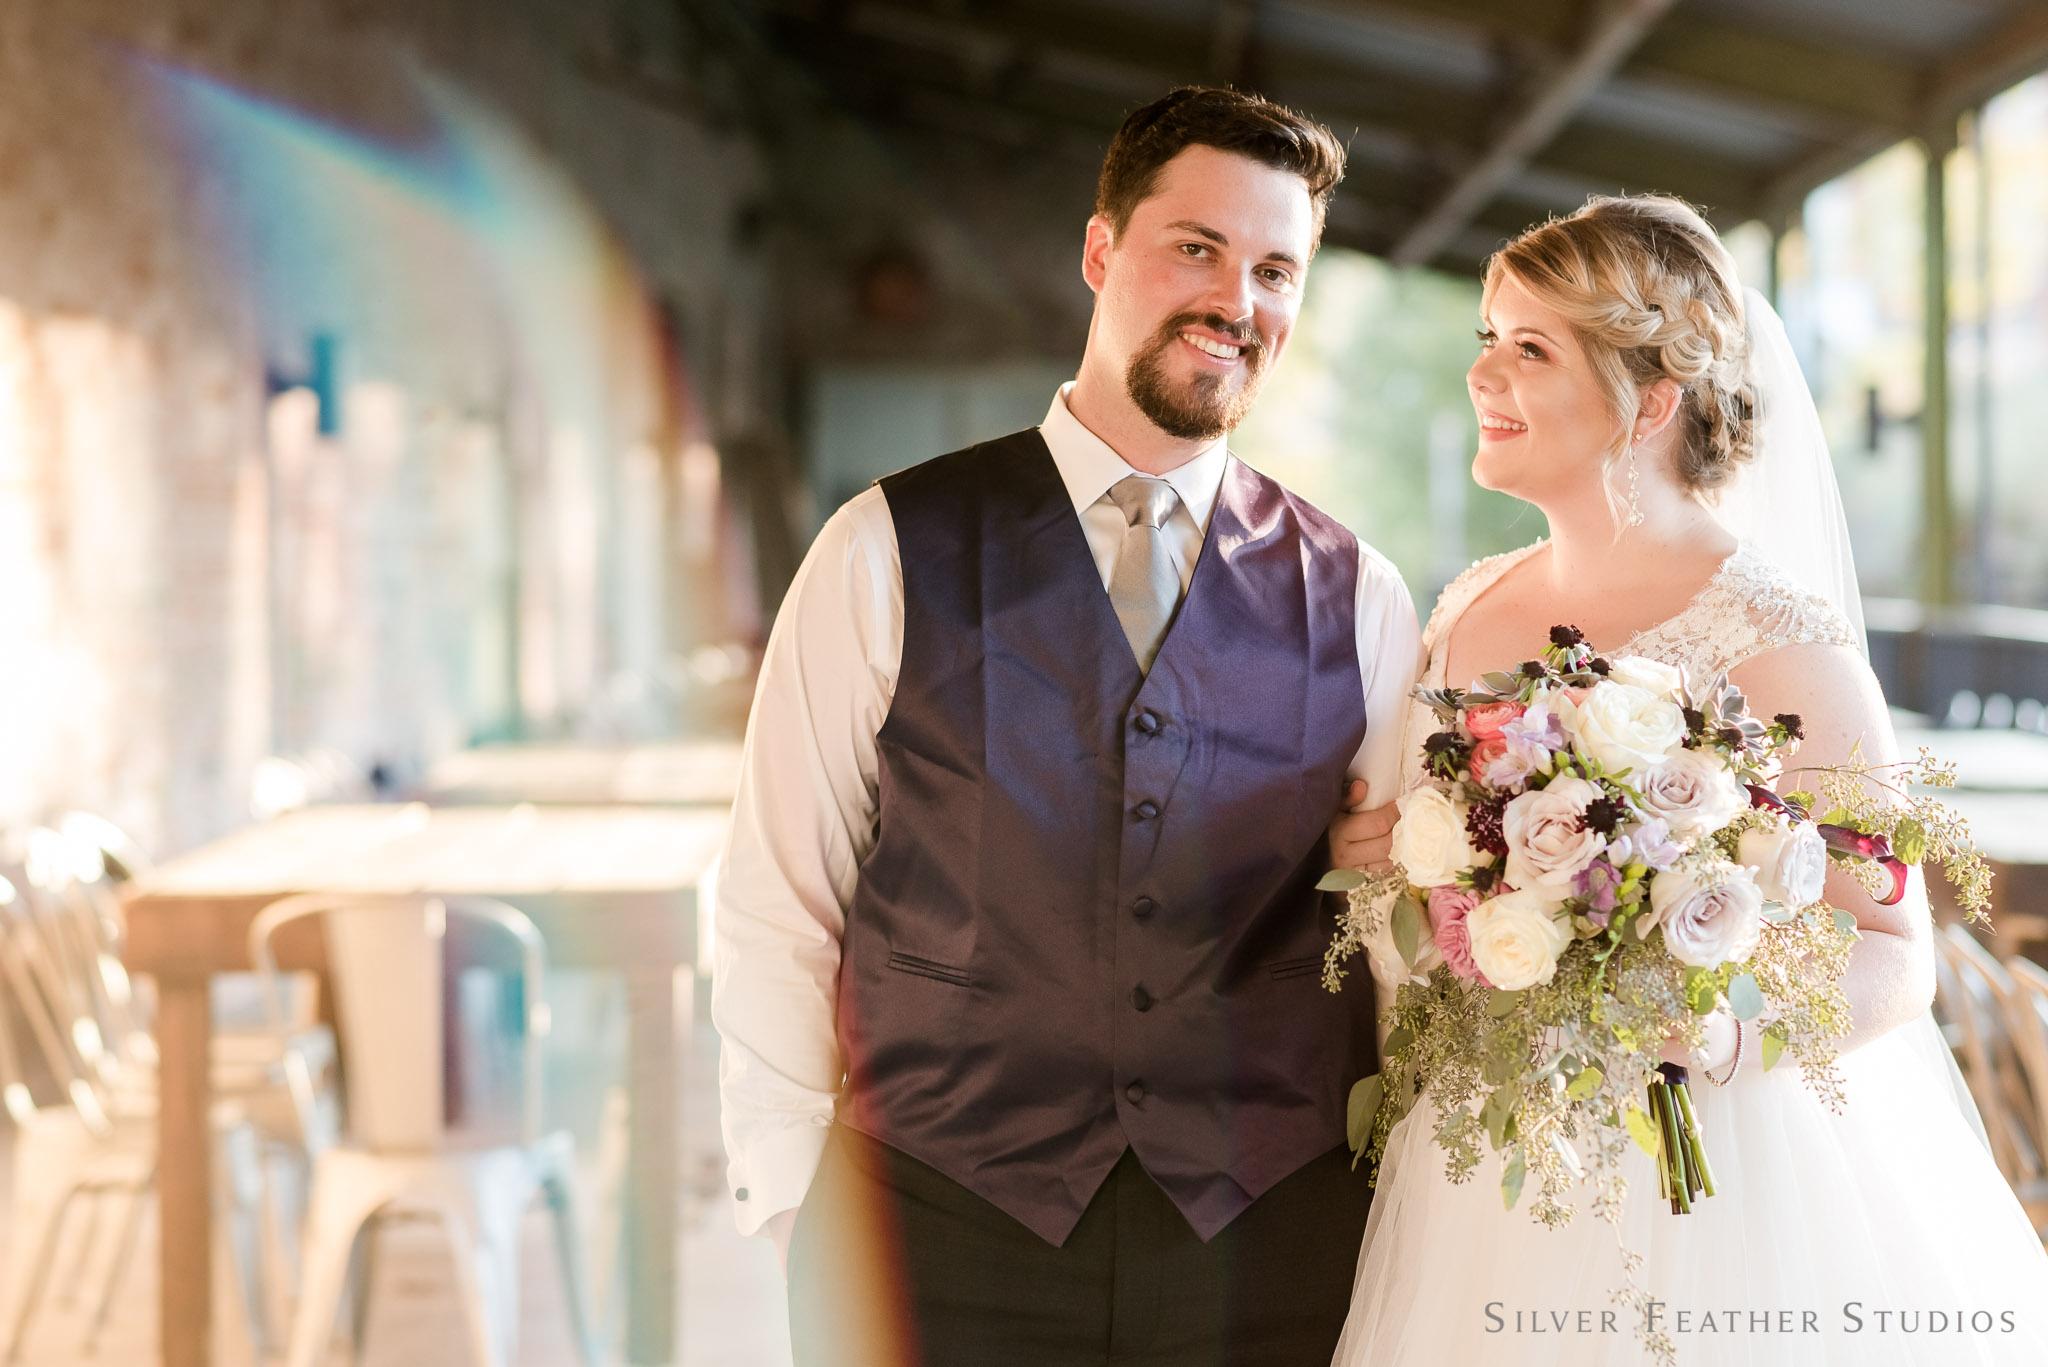 cottom-room-wedding-photography-021.jpg